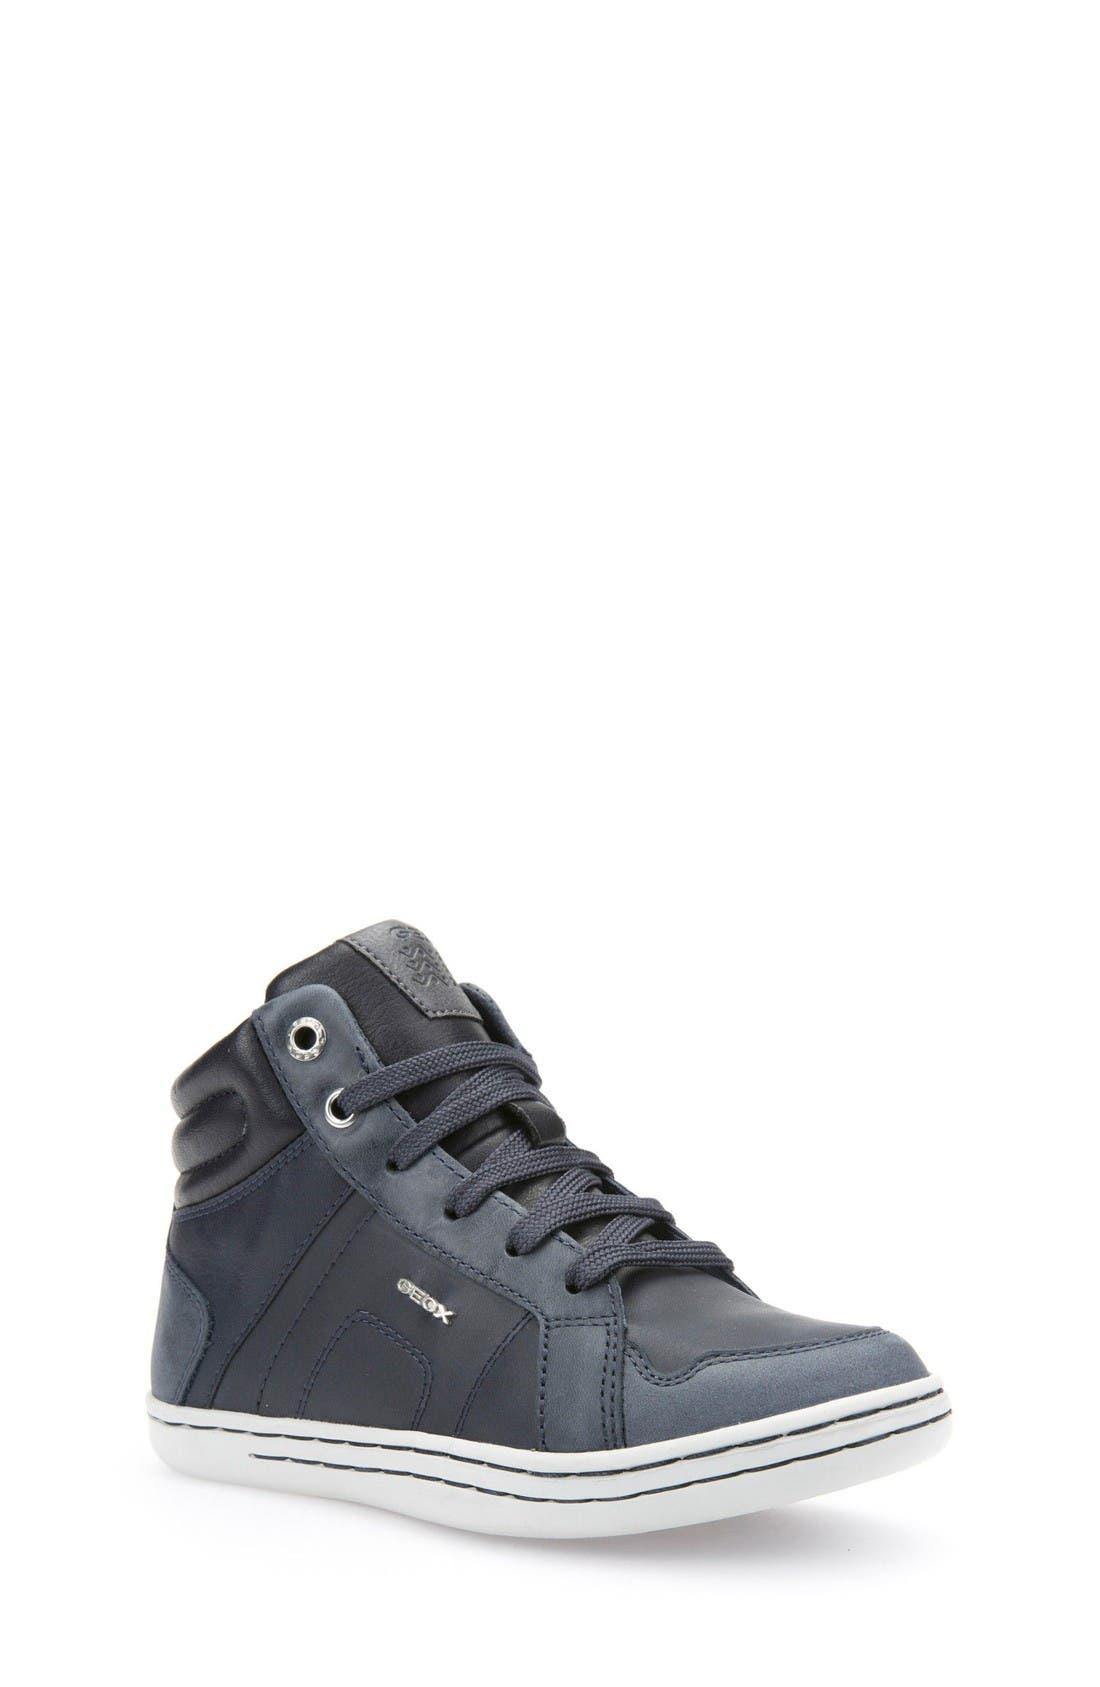 GEOX 'Garcia' High TopSneaker